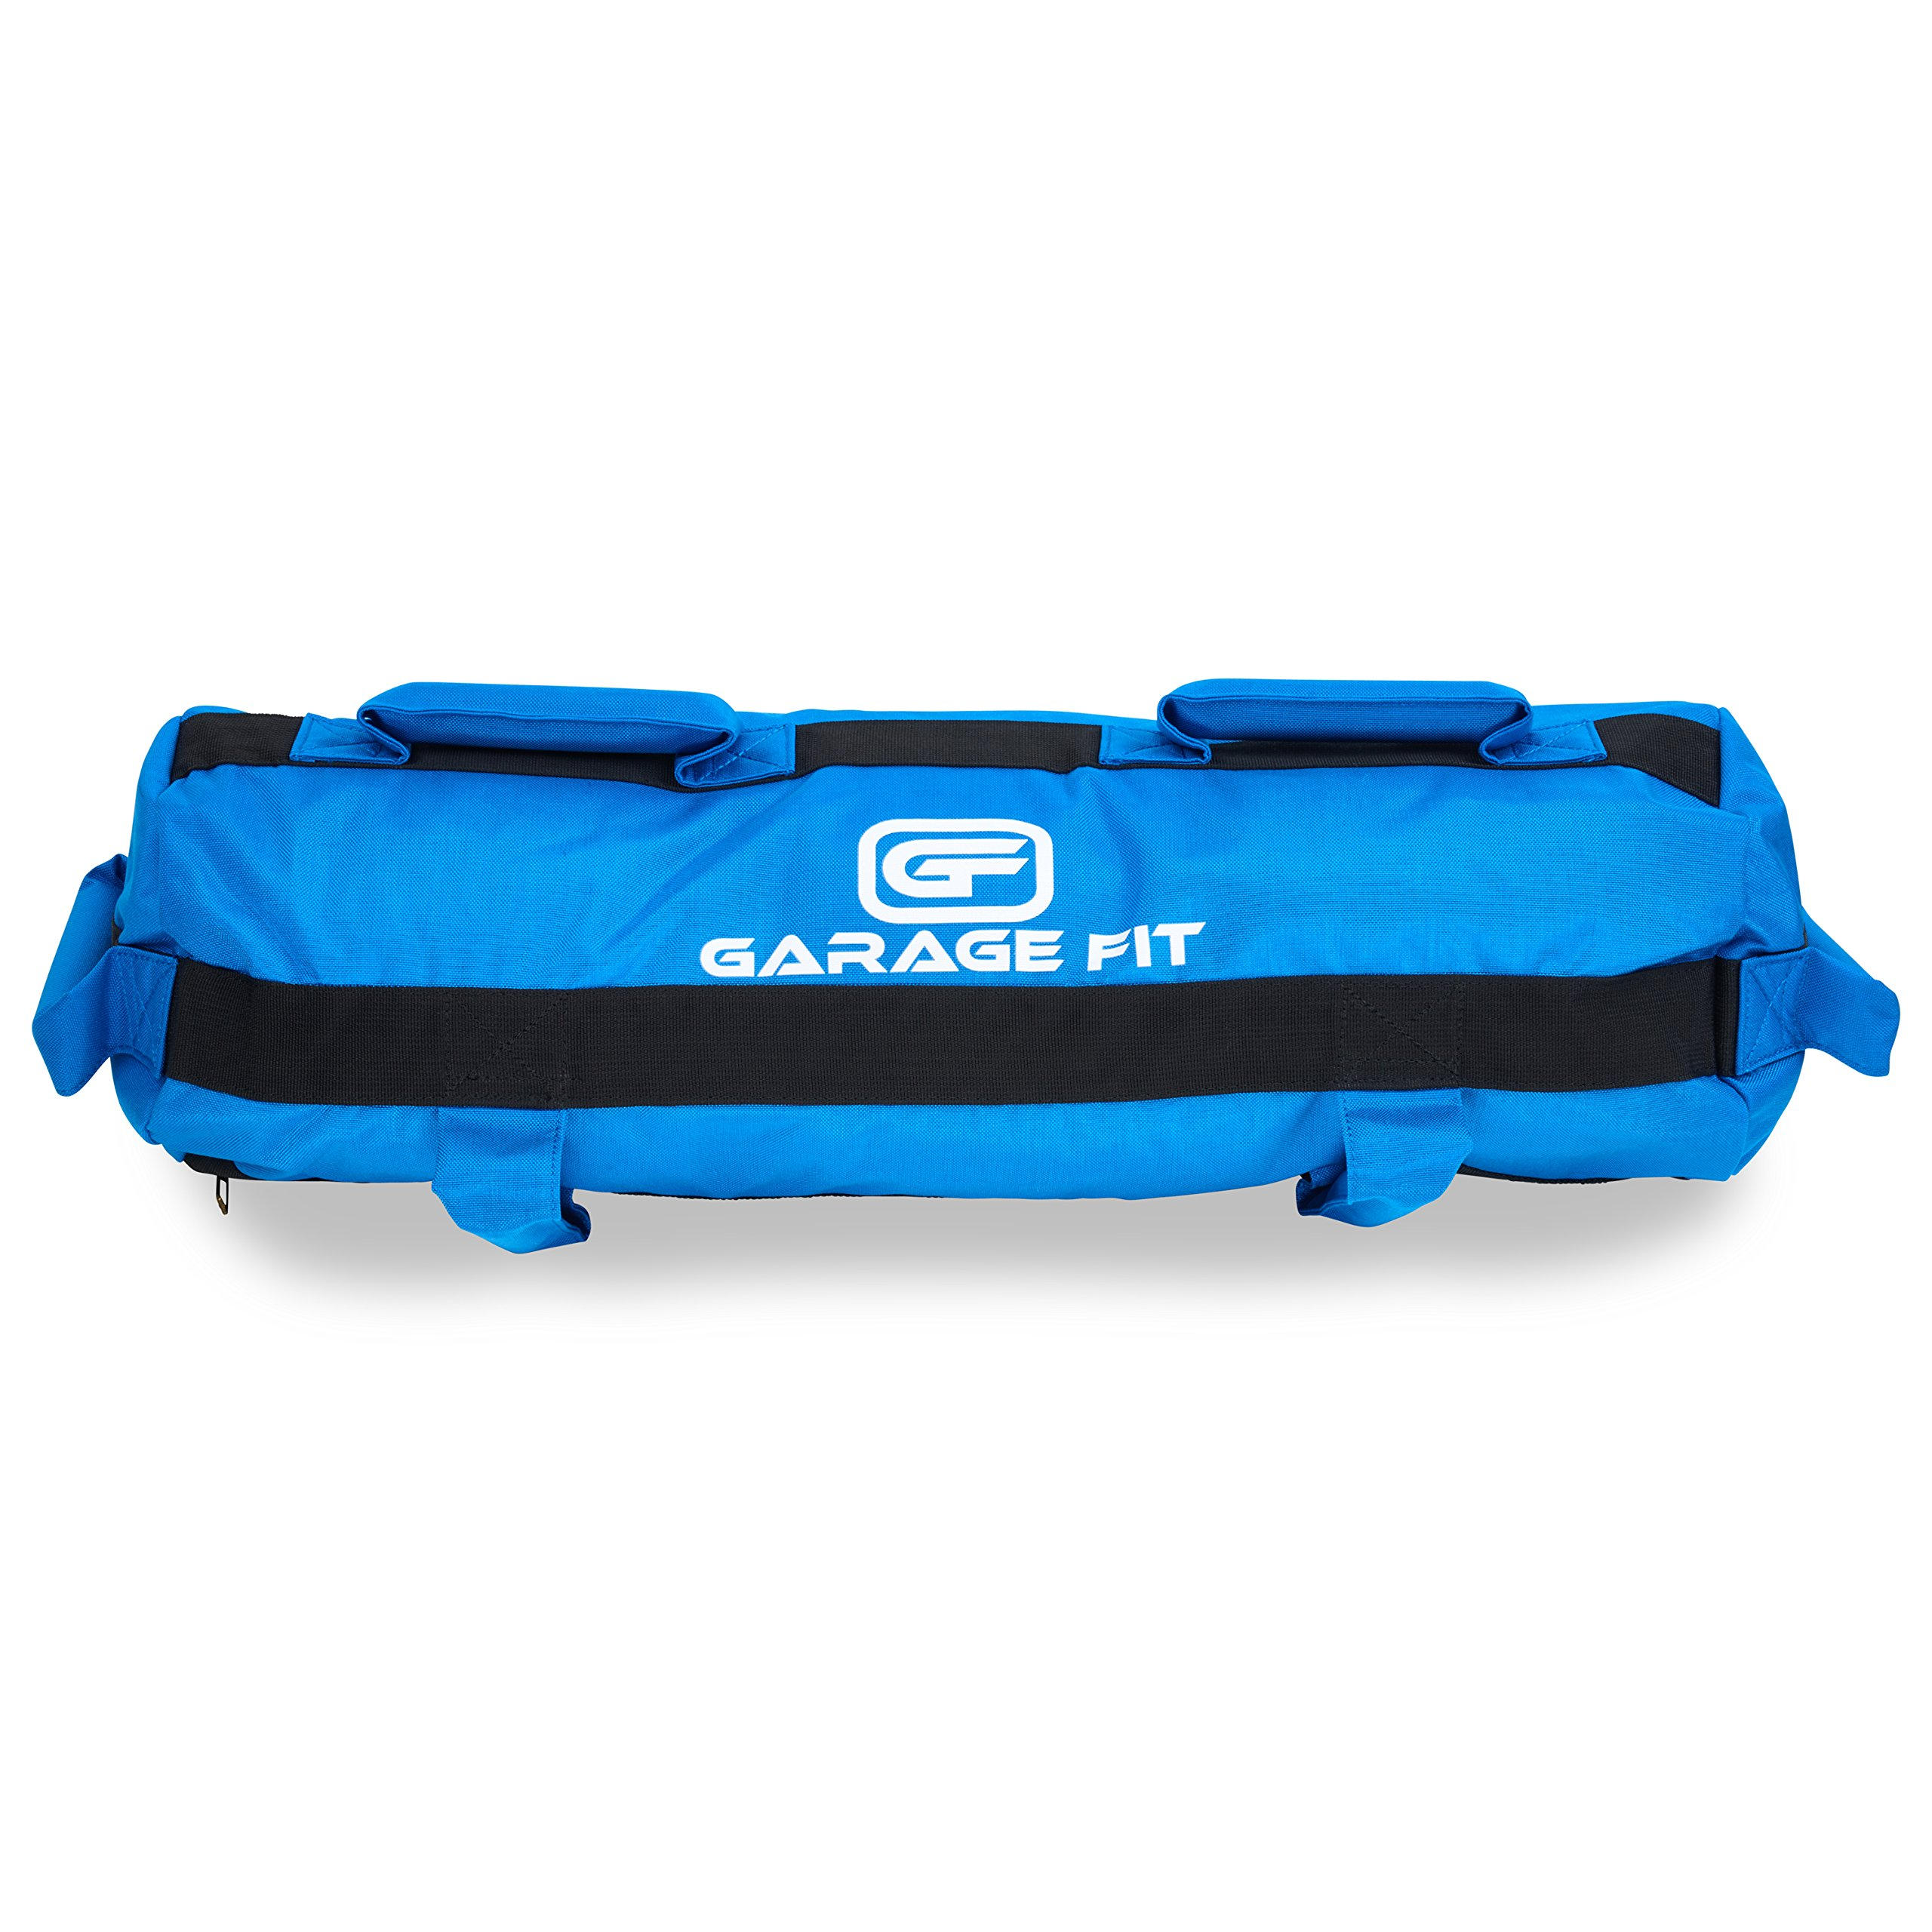 Garage Fit Heavy Duty Workout Sandbags for Fitness, Exercise Sandbags, Military Sandbags, Weighted Bags, Weighted Sandbag, Fitness Sandbags, Training Sandbags (Blue Rubber Core Handle, 20-60 lbs)